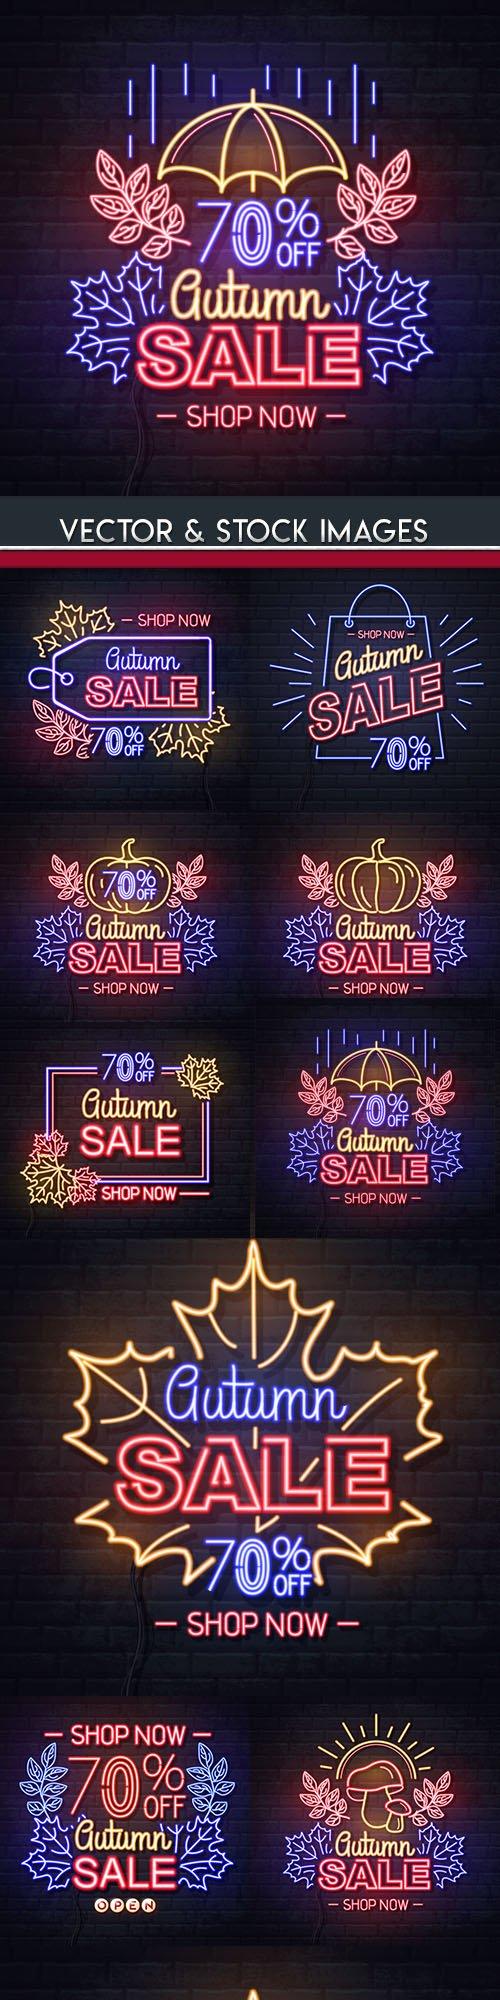 Autumn sale special offer decorative background